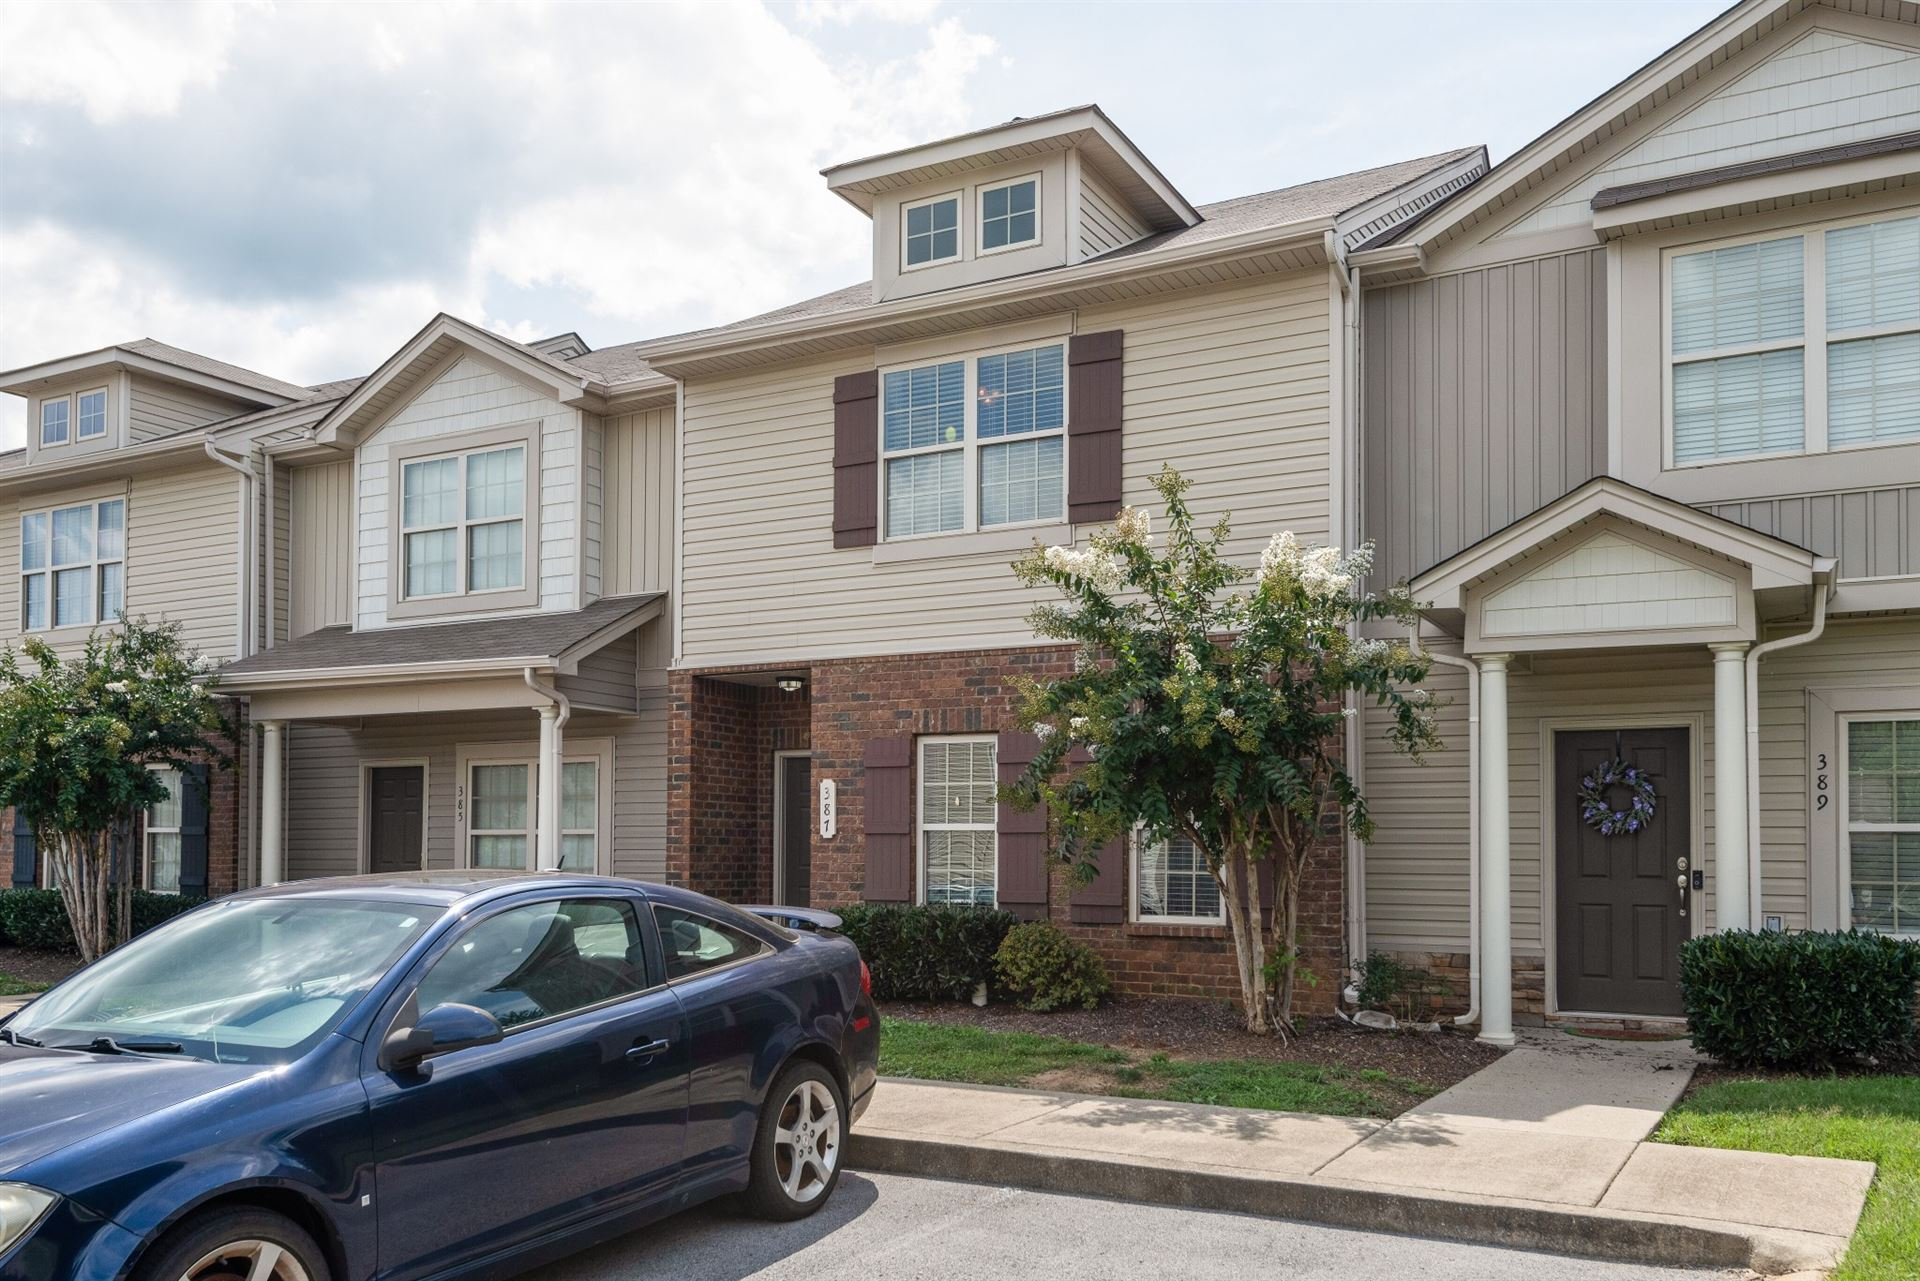 Photo of 387 Brooklet Ct, Murfreesboro, TN 37128 (MLS # 2288520)